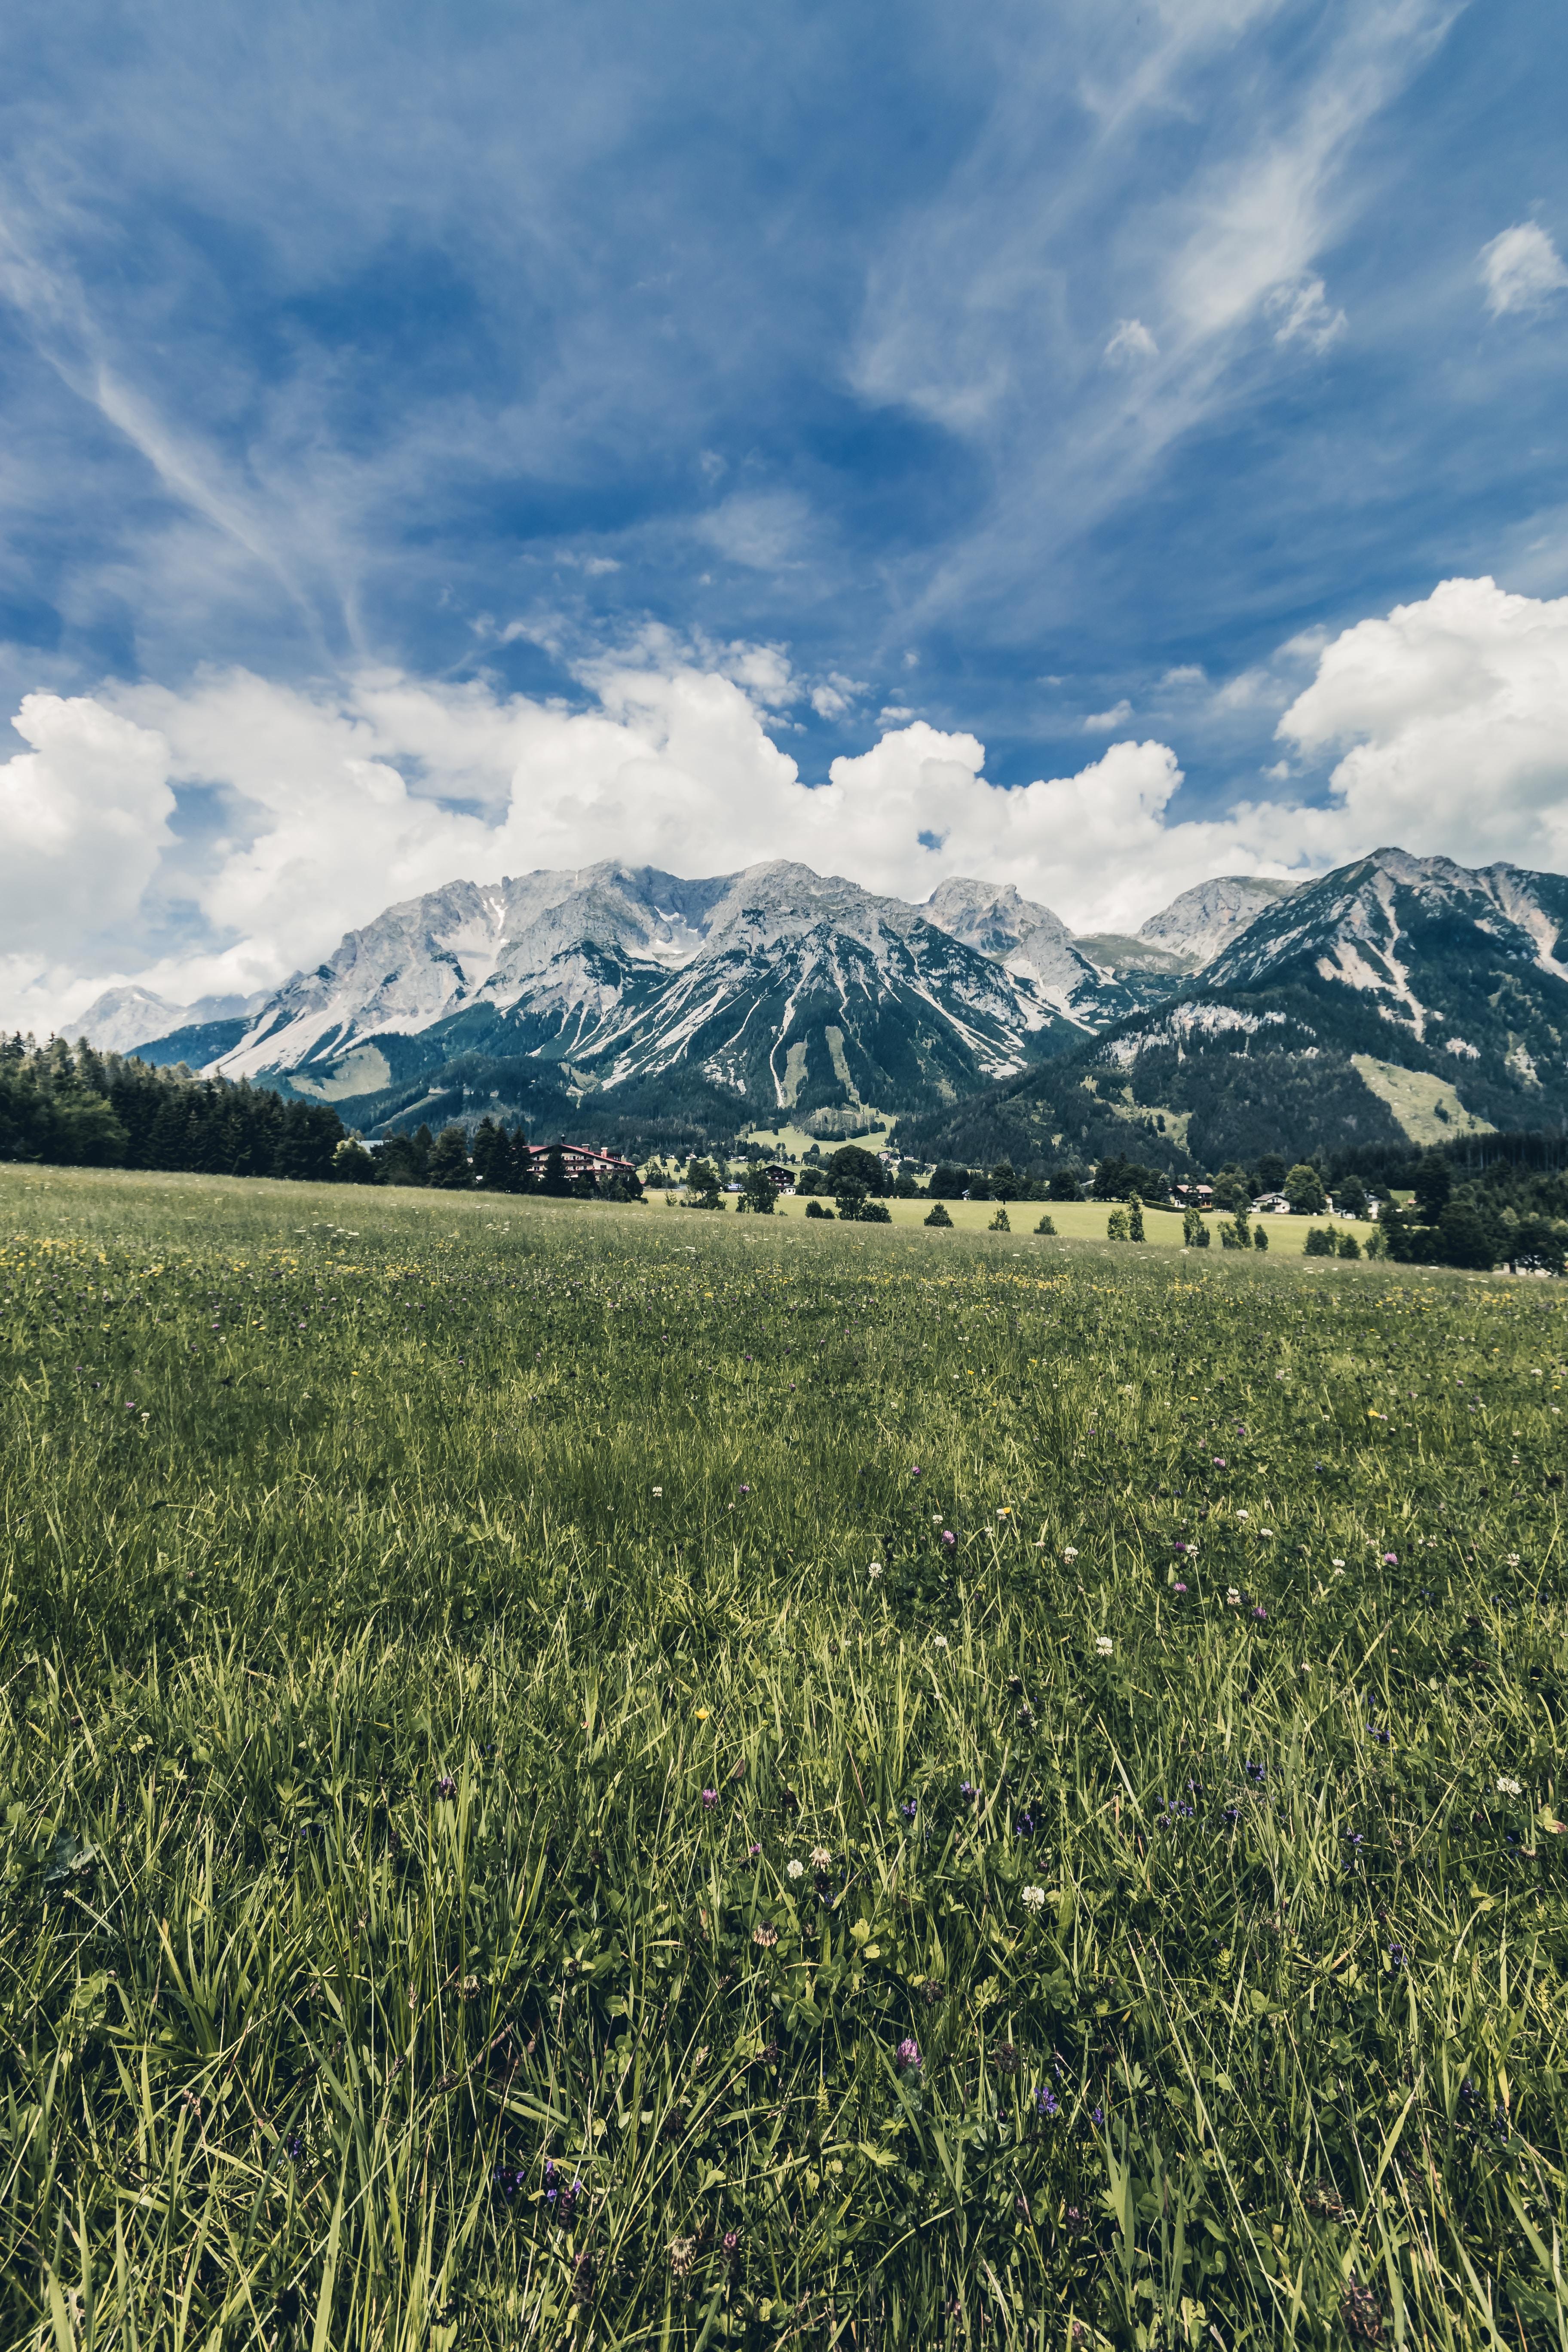 snow capped mountain near grass field